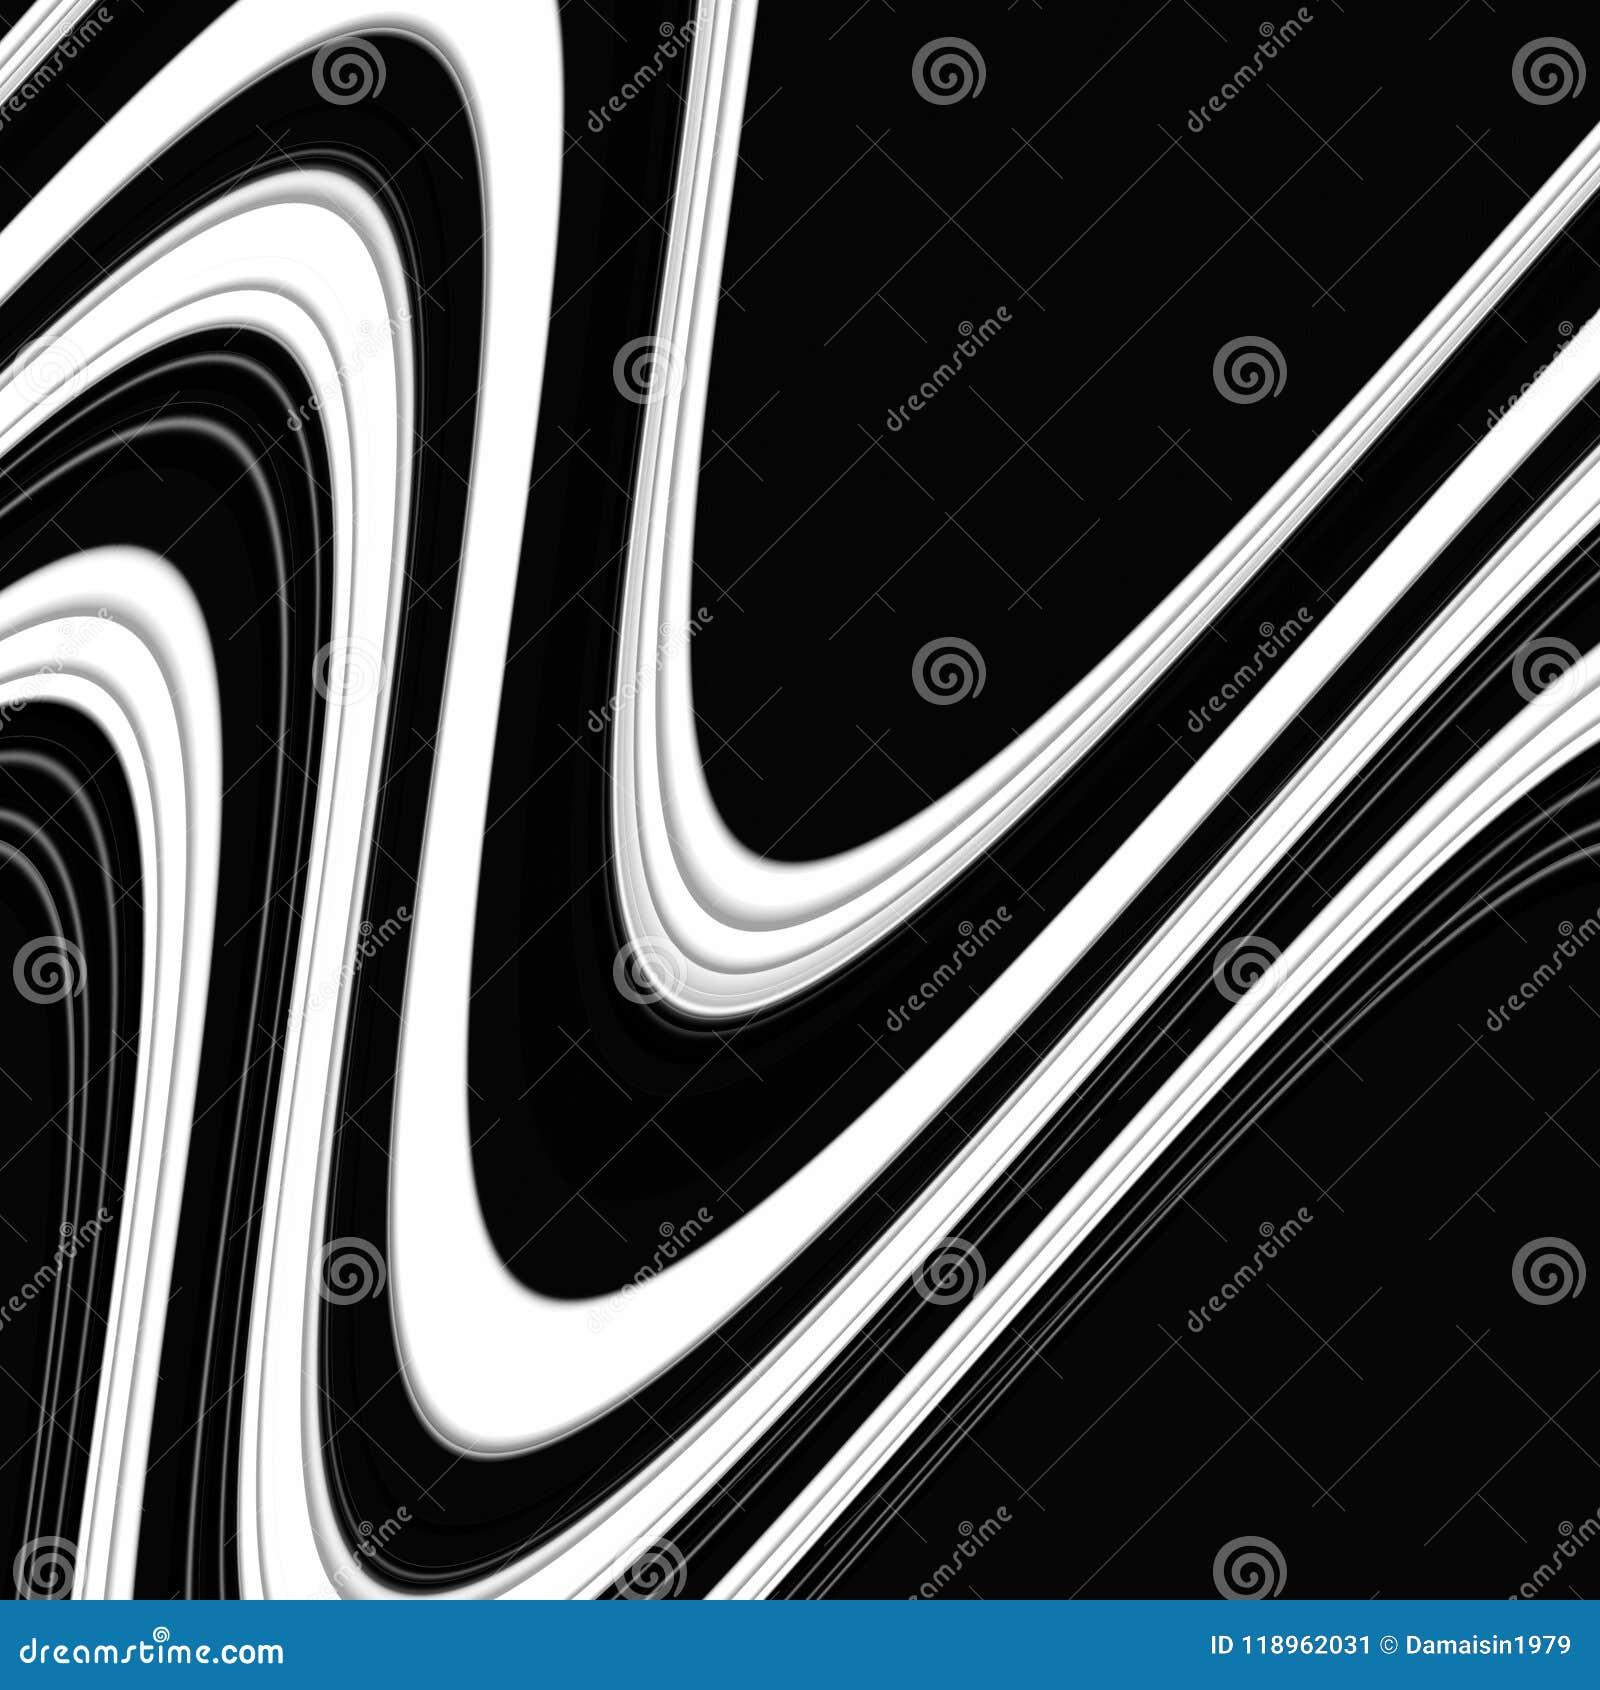 Vloeibare speelse meetkunde in zwarte witte tinten, abstracte achtergrond, fantasie